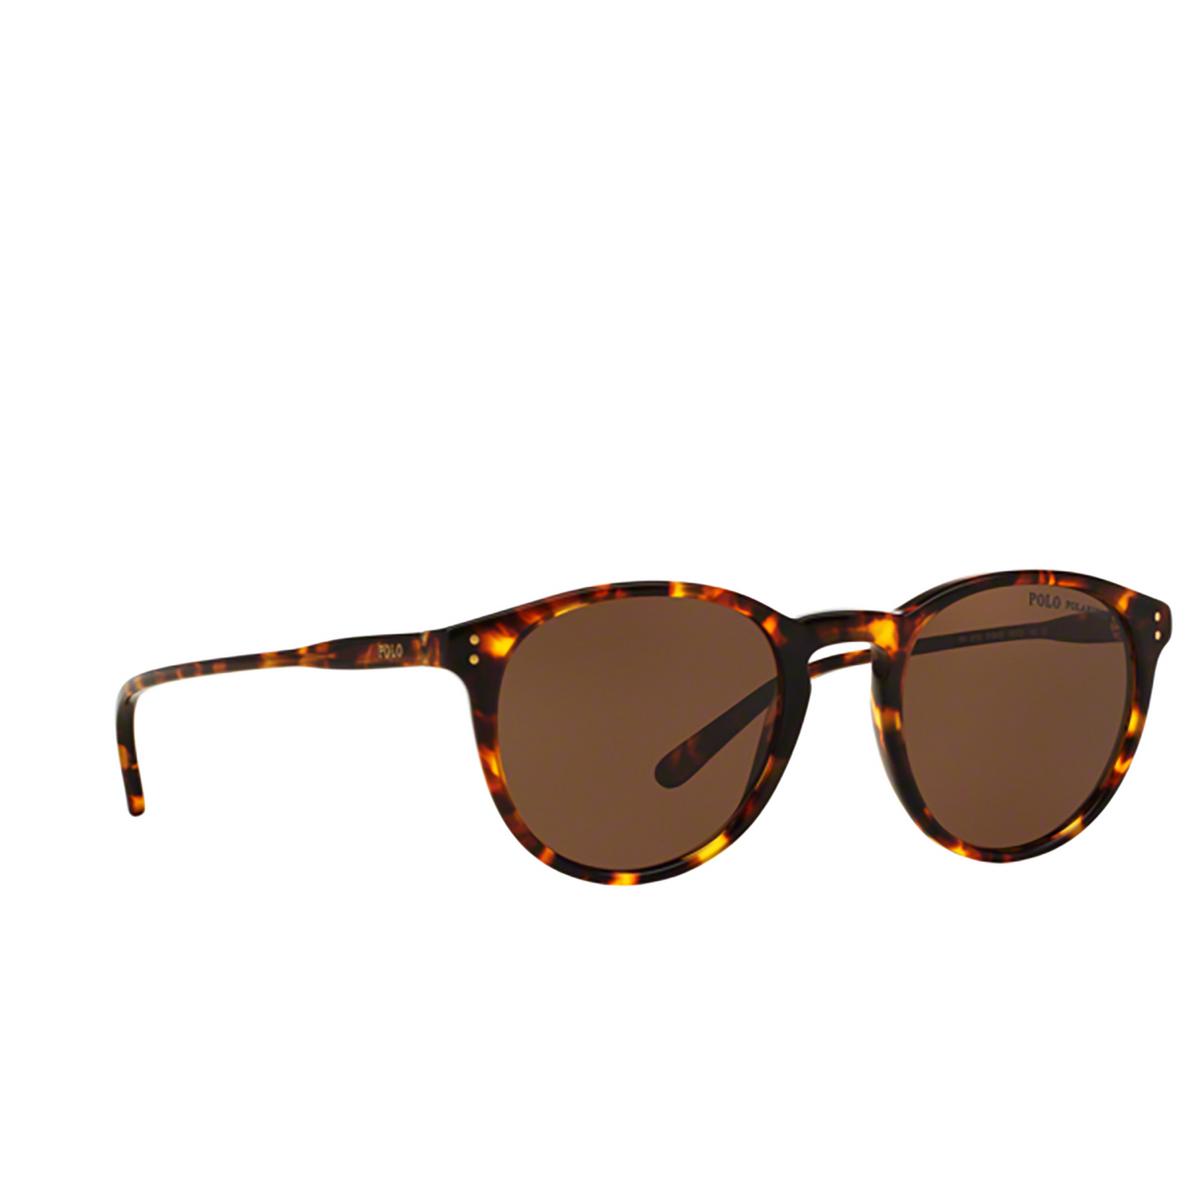 Polo Ralph Lauren® Round Sunglasses: PH4110 color Shiny Antique Havana 513473 - three-quarters view.